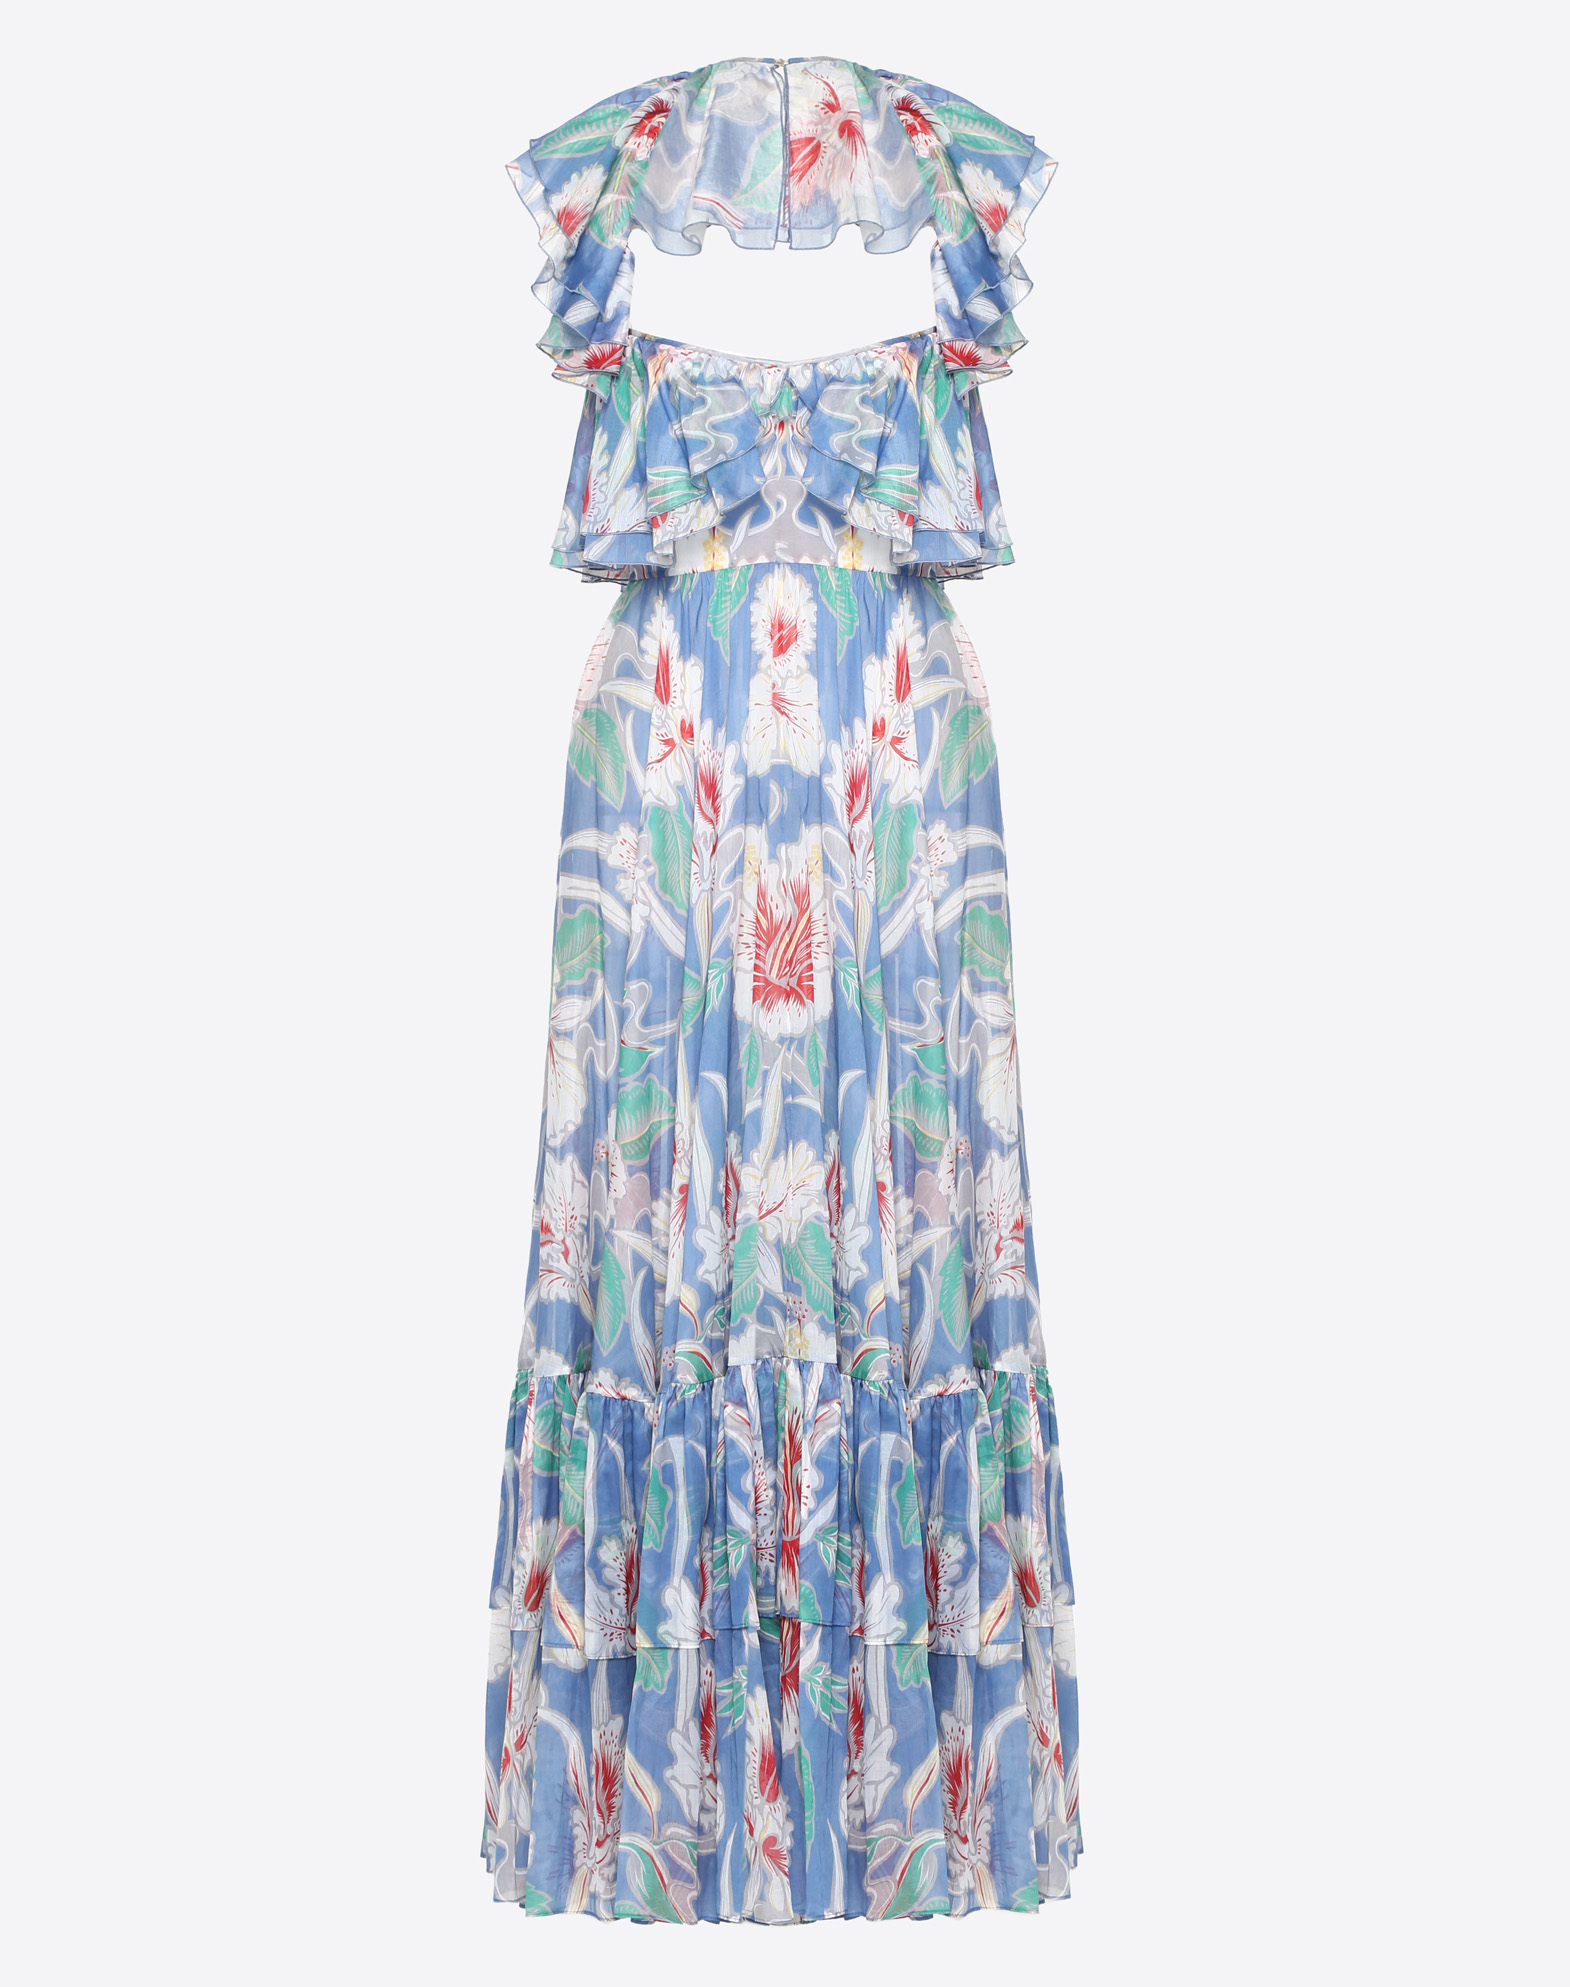 Hawaiian Hibiscus Cotton Voile Dress